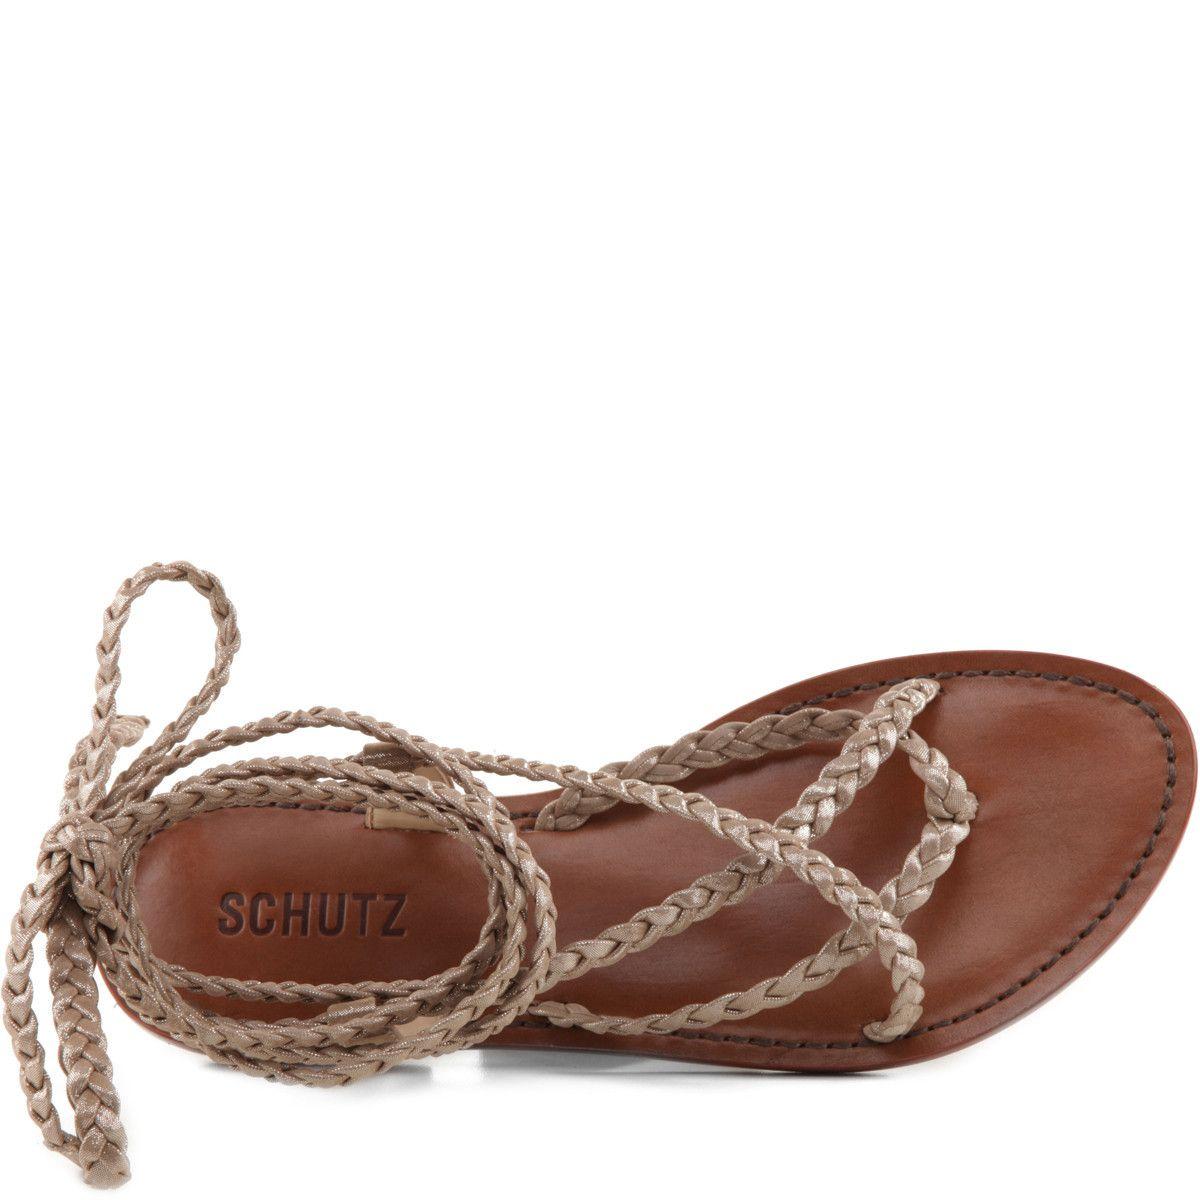 #KONGA #SchutzShoes #flats #sandals #gold #braided #shoes